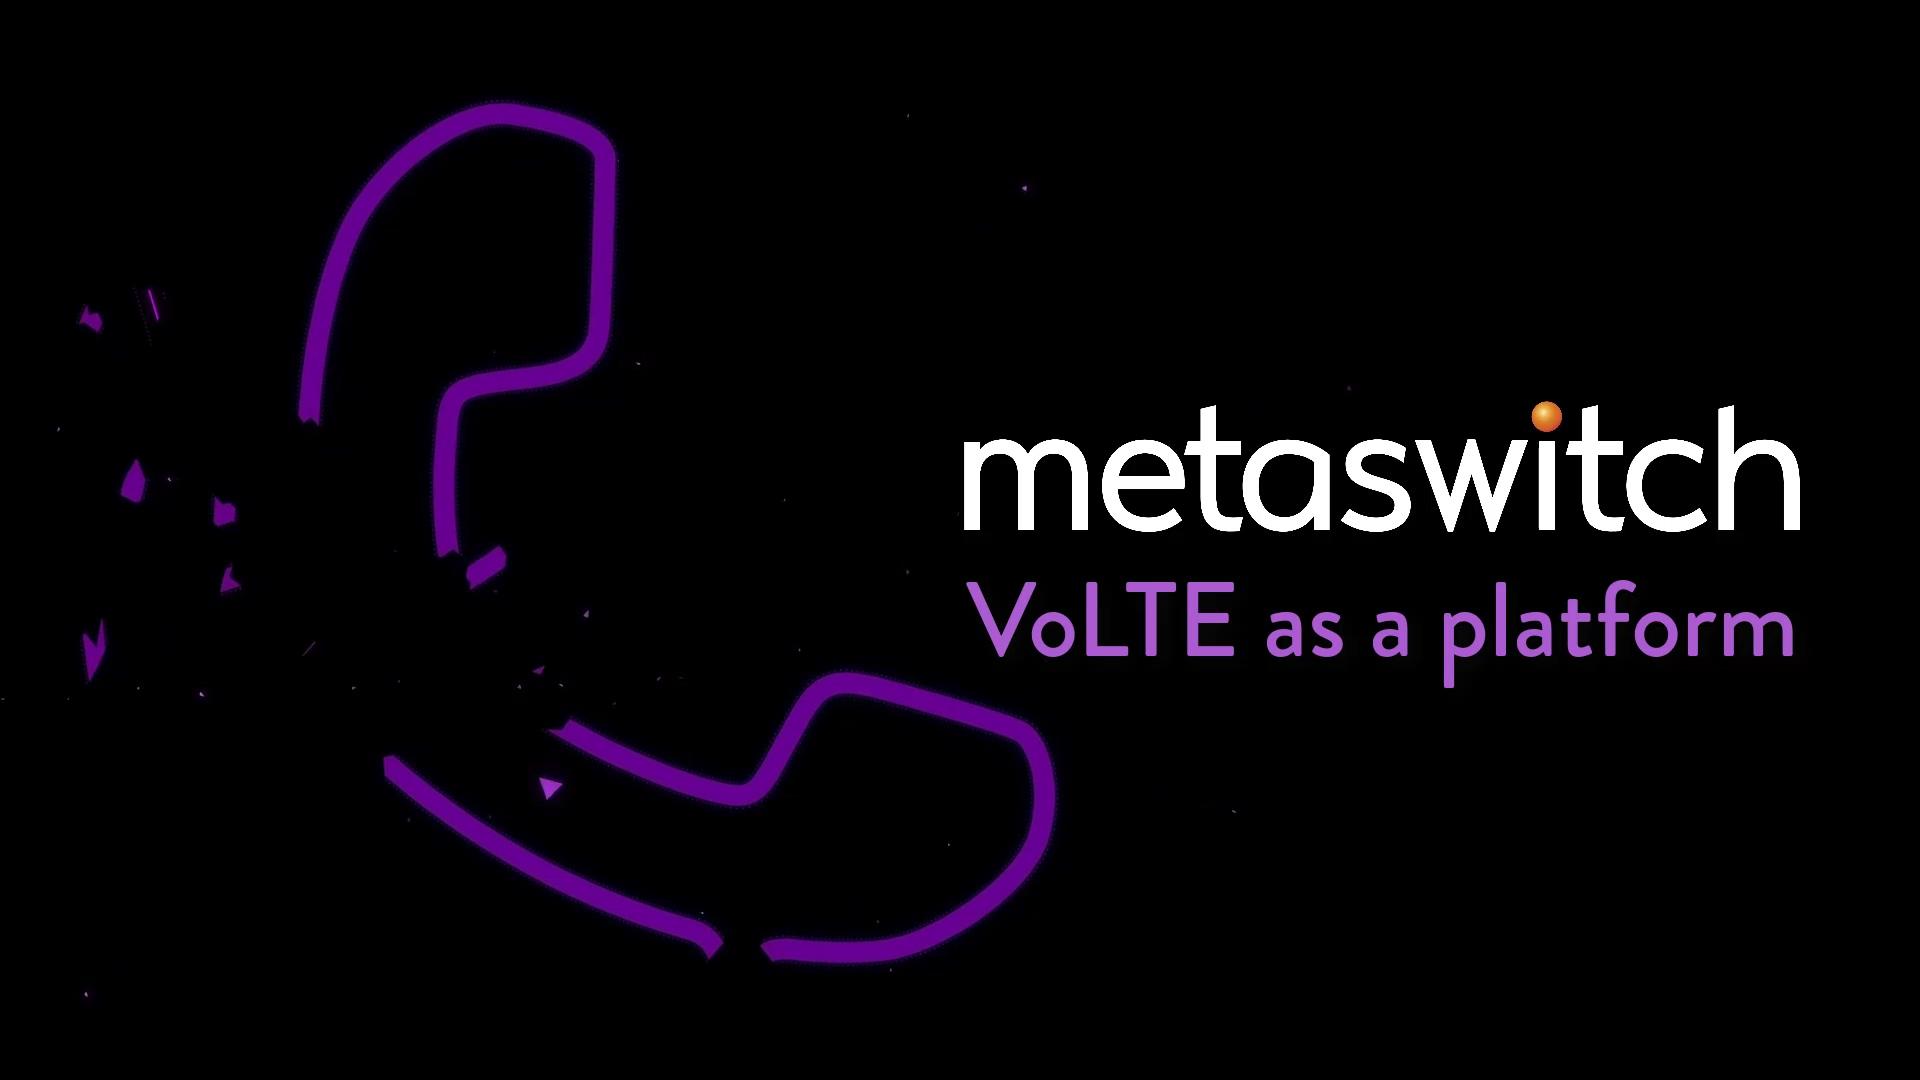 VoLTE-as-a-platform